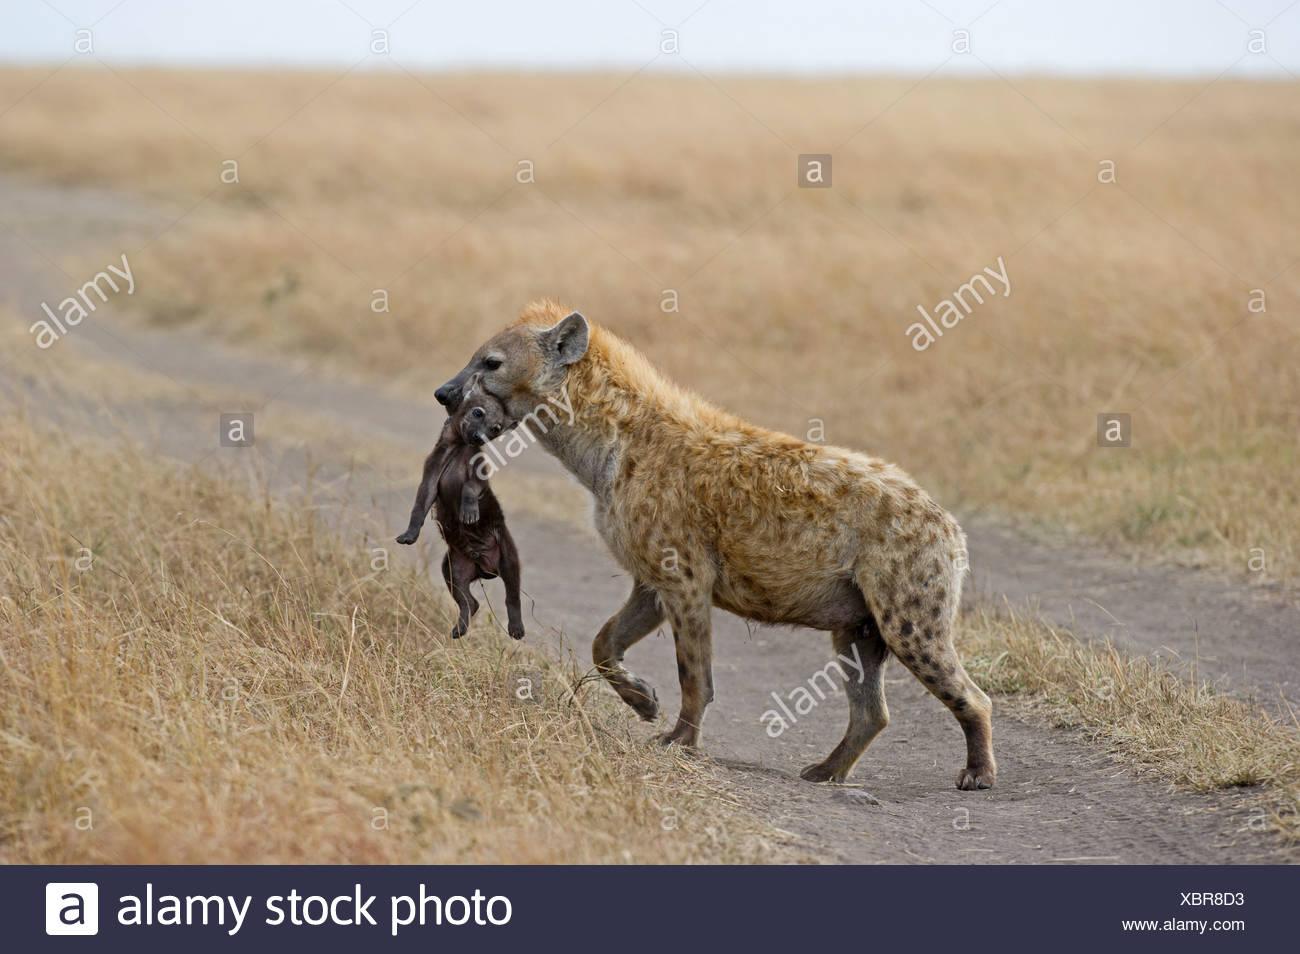 Spotted Hyena Crocuta crocuta with young pup Masai Mara Kenya Stock Photo